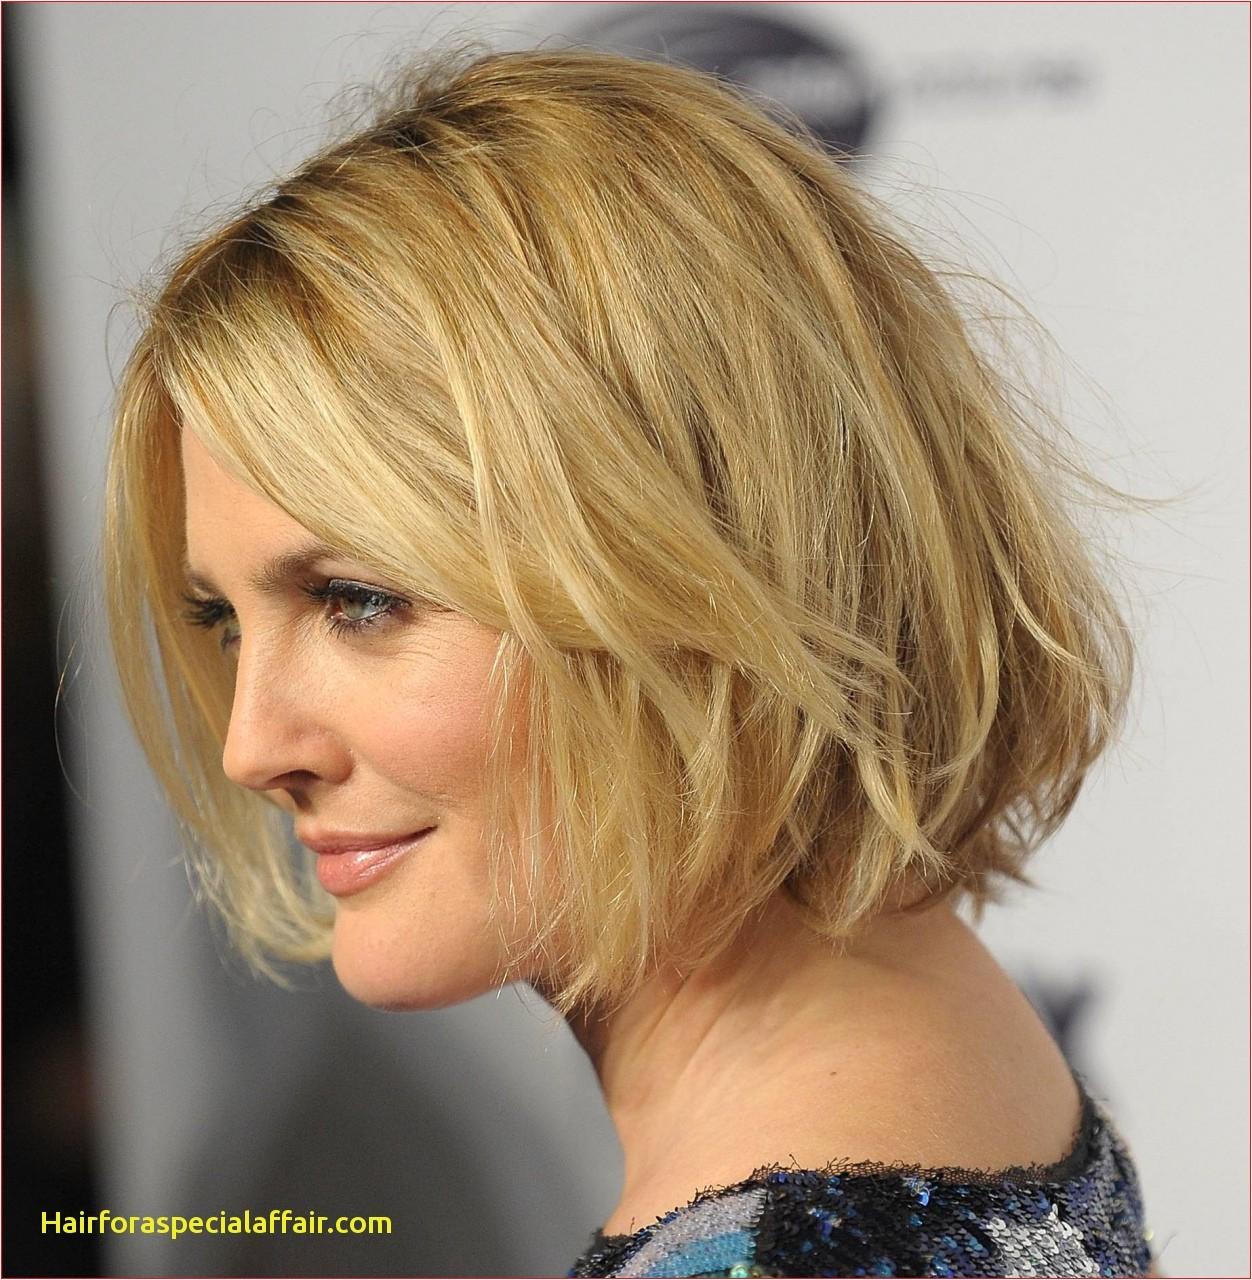 77 Good Hairstyles for Long Hair New Medium Length Bob Hairstyles New I Pinimg 1200x 0d